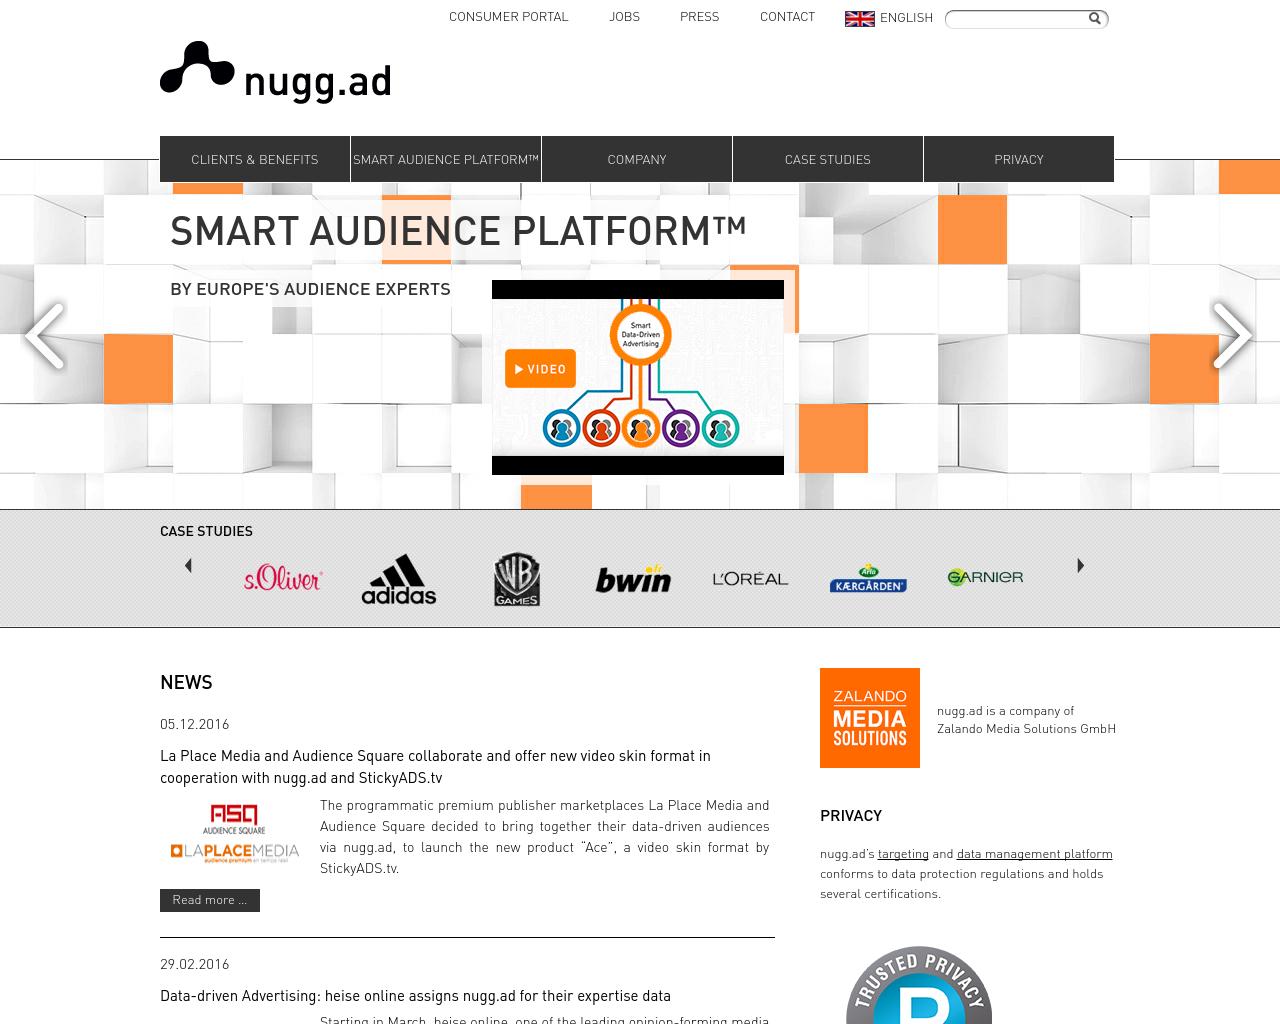 Nuggad-Advertising-Reviews-Pricing